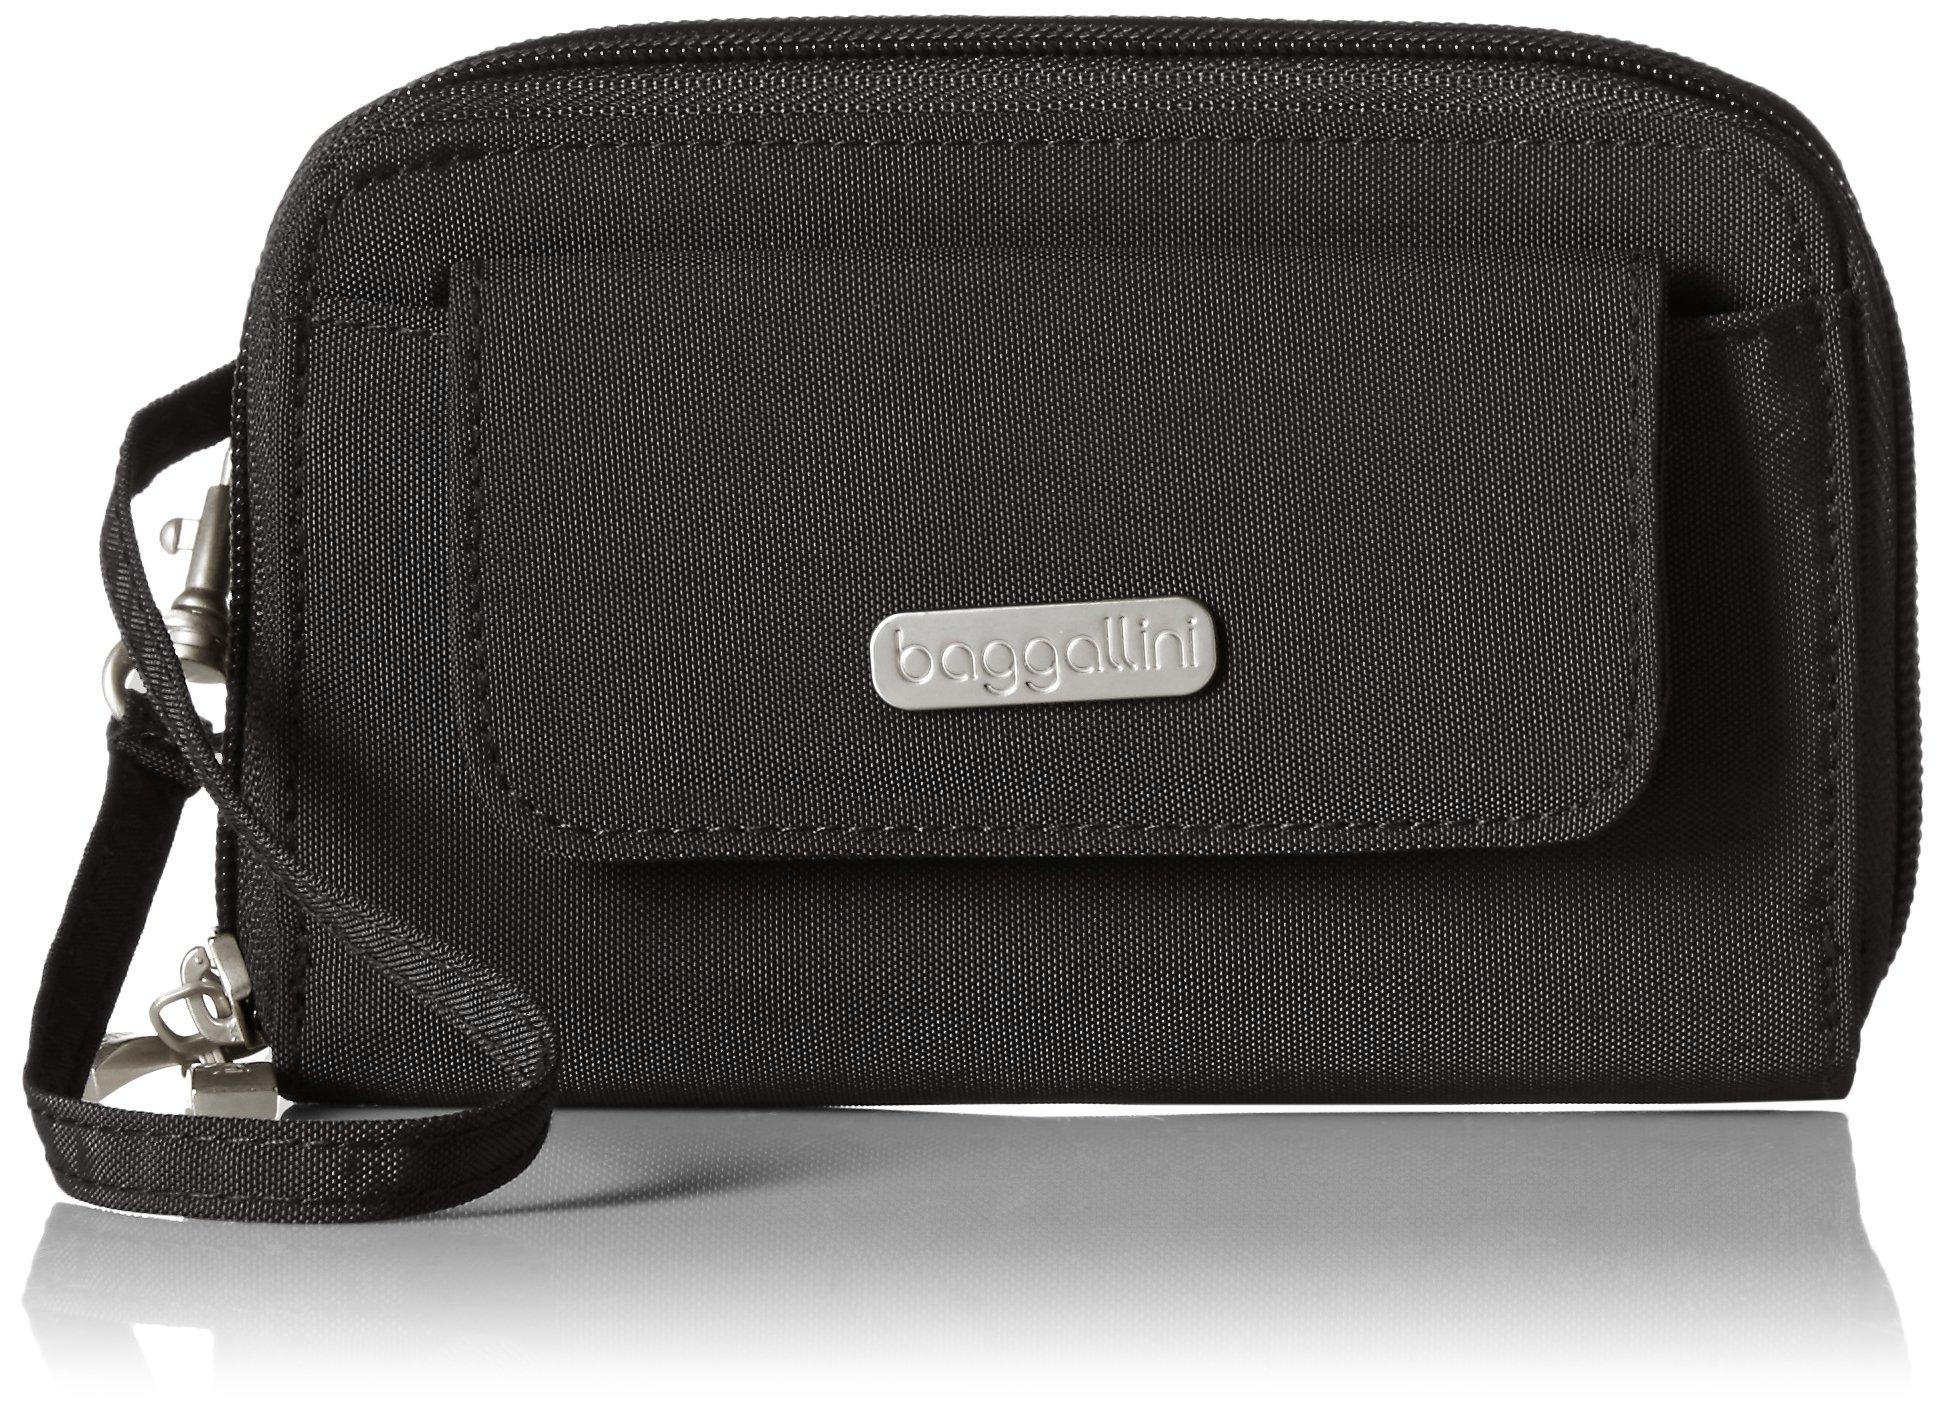 Baggallini Wallet Wristlet, Black/S